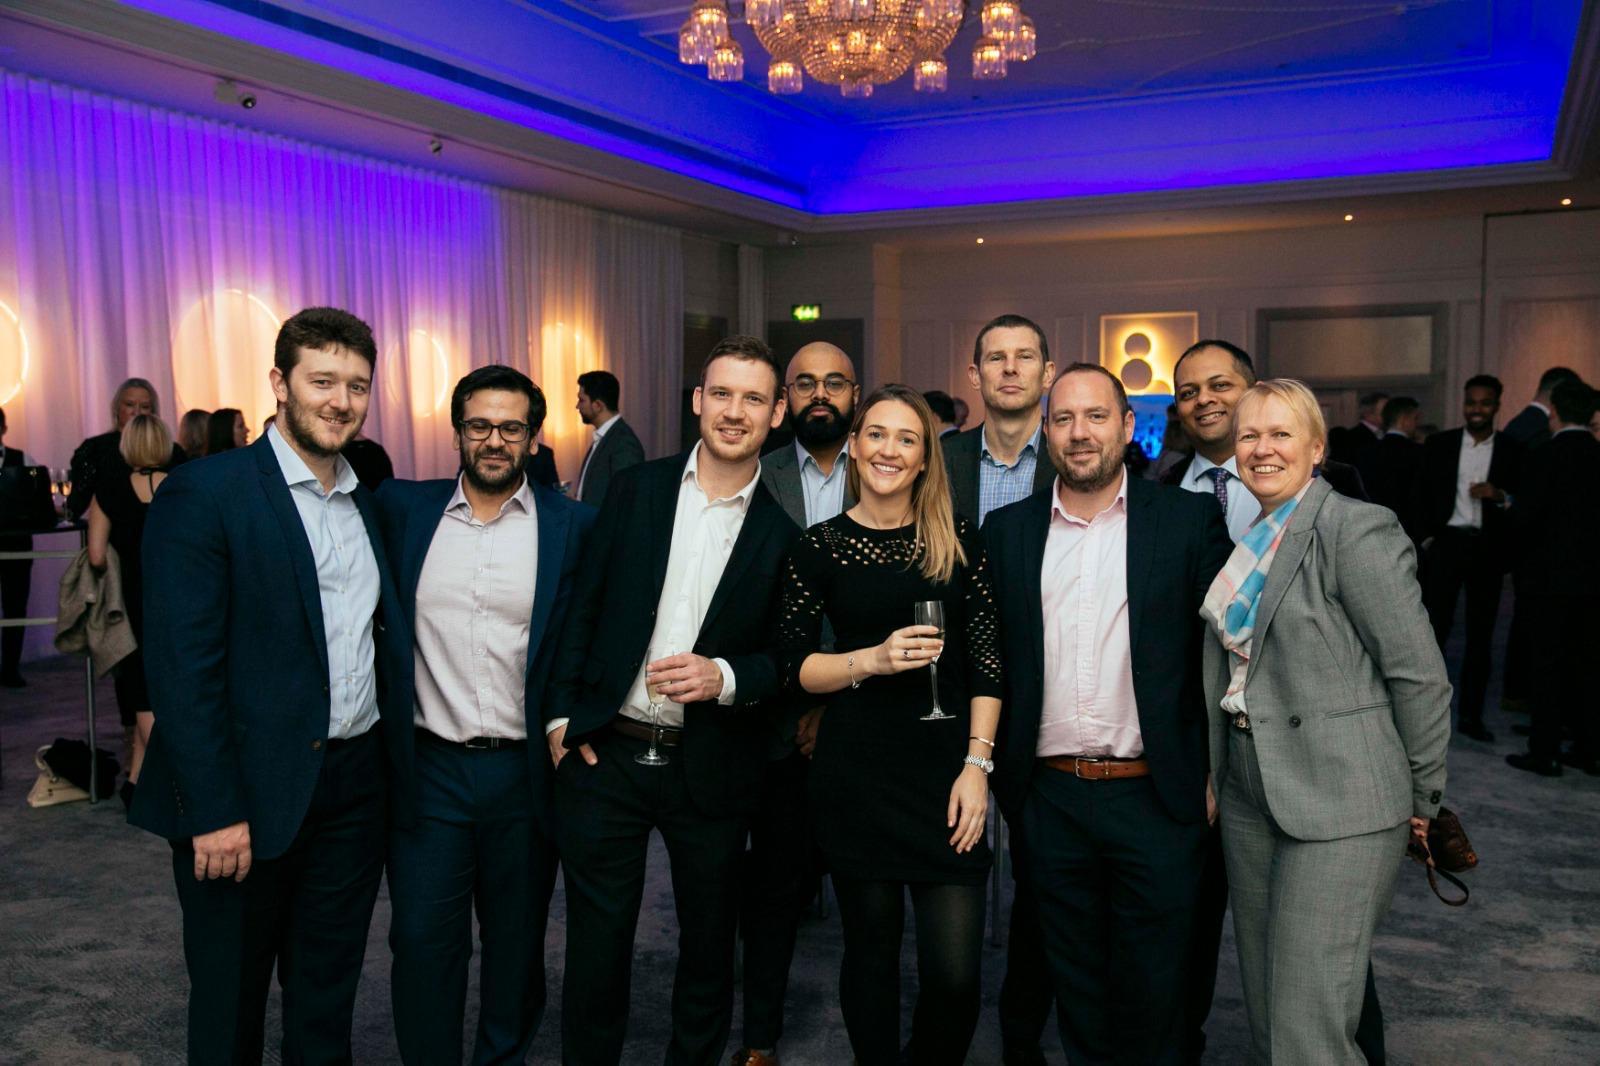 Telstra purple team - digital transformation evening event